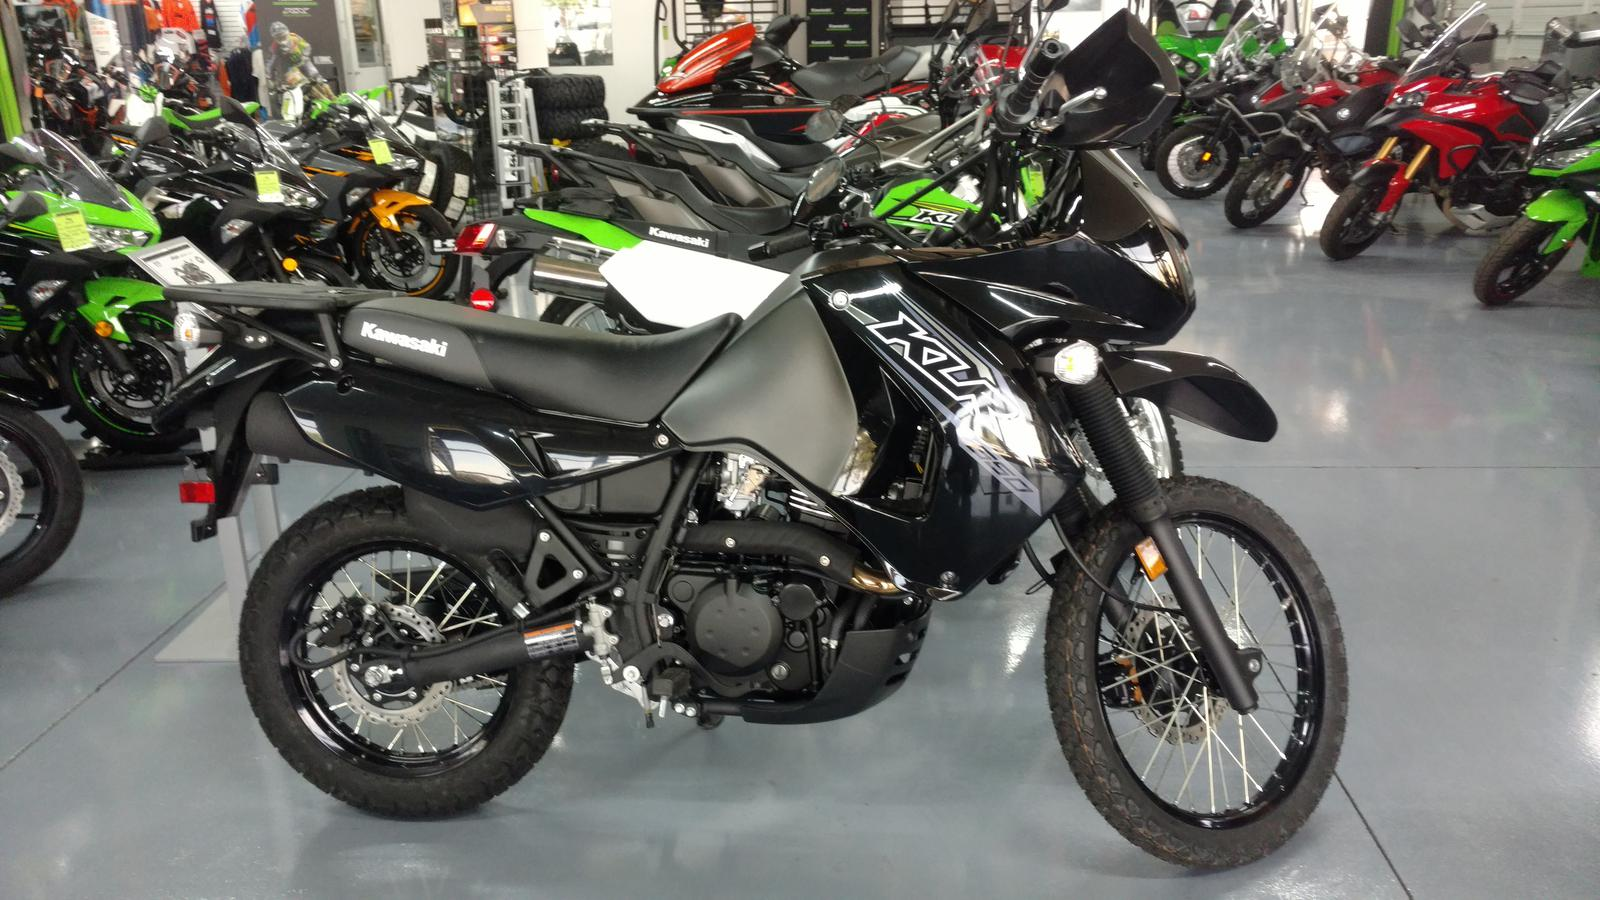 2018 Kawasaki KLR 650 for sale in Tucson, AZ. AZKKT, Inc. Tucson, AZ ...